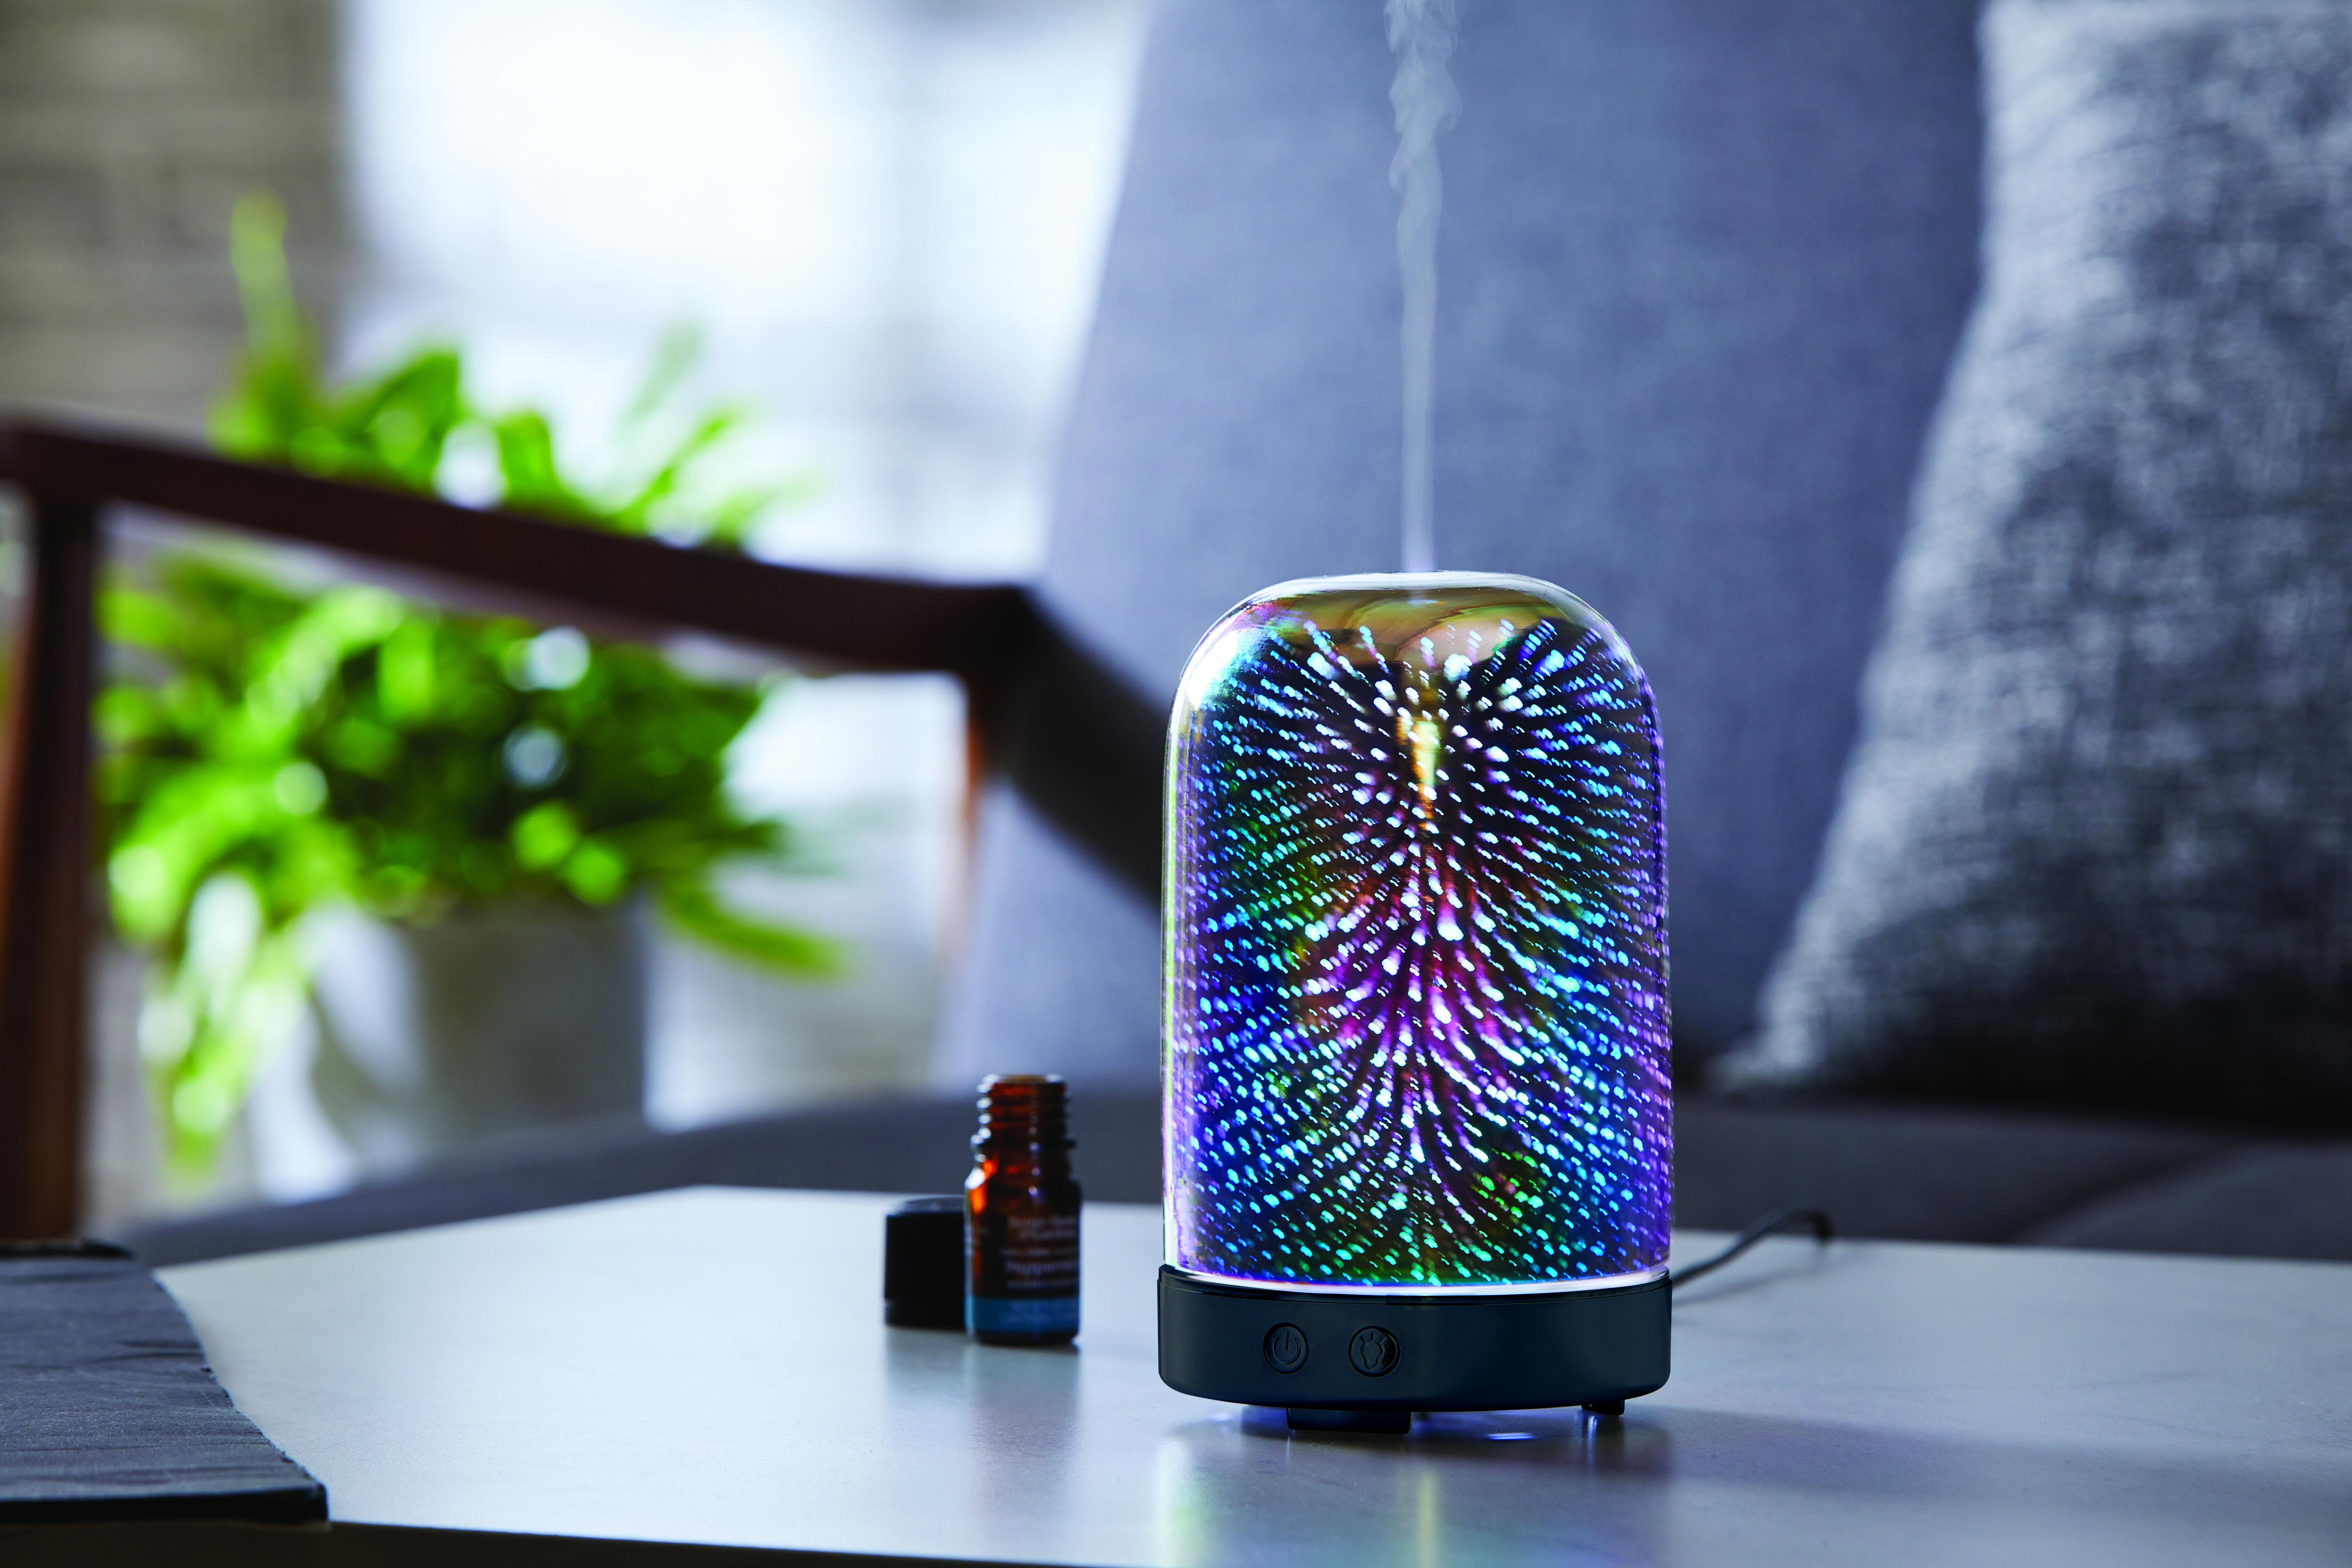 4371933dff63fd68deb181170a59f648 - Better Homes & Gardens 100 Ml Ultrasonic Aroma Diffuser Stargaze